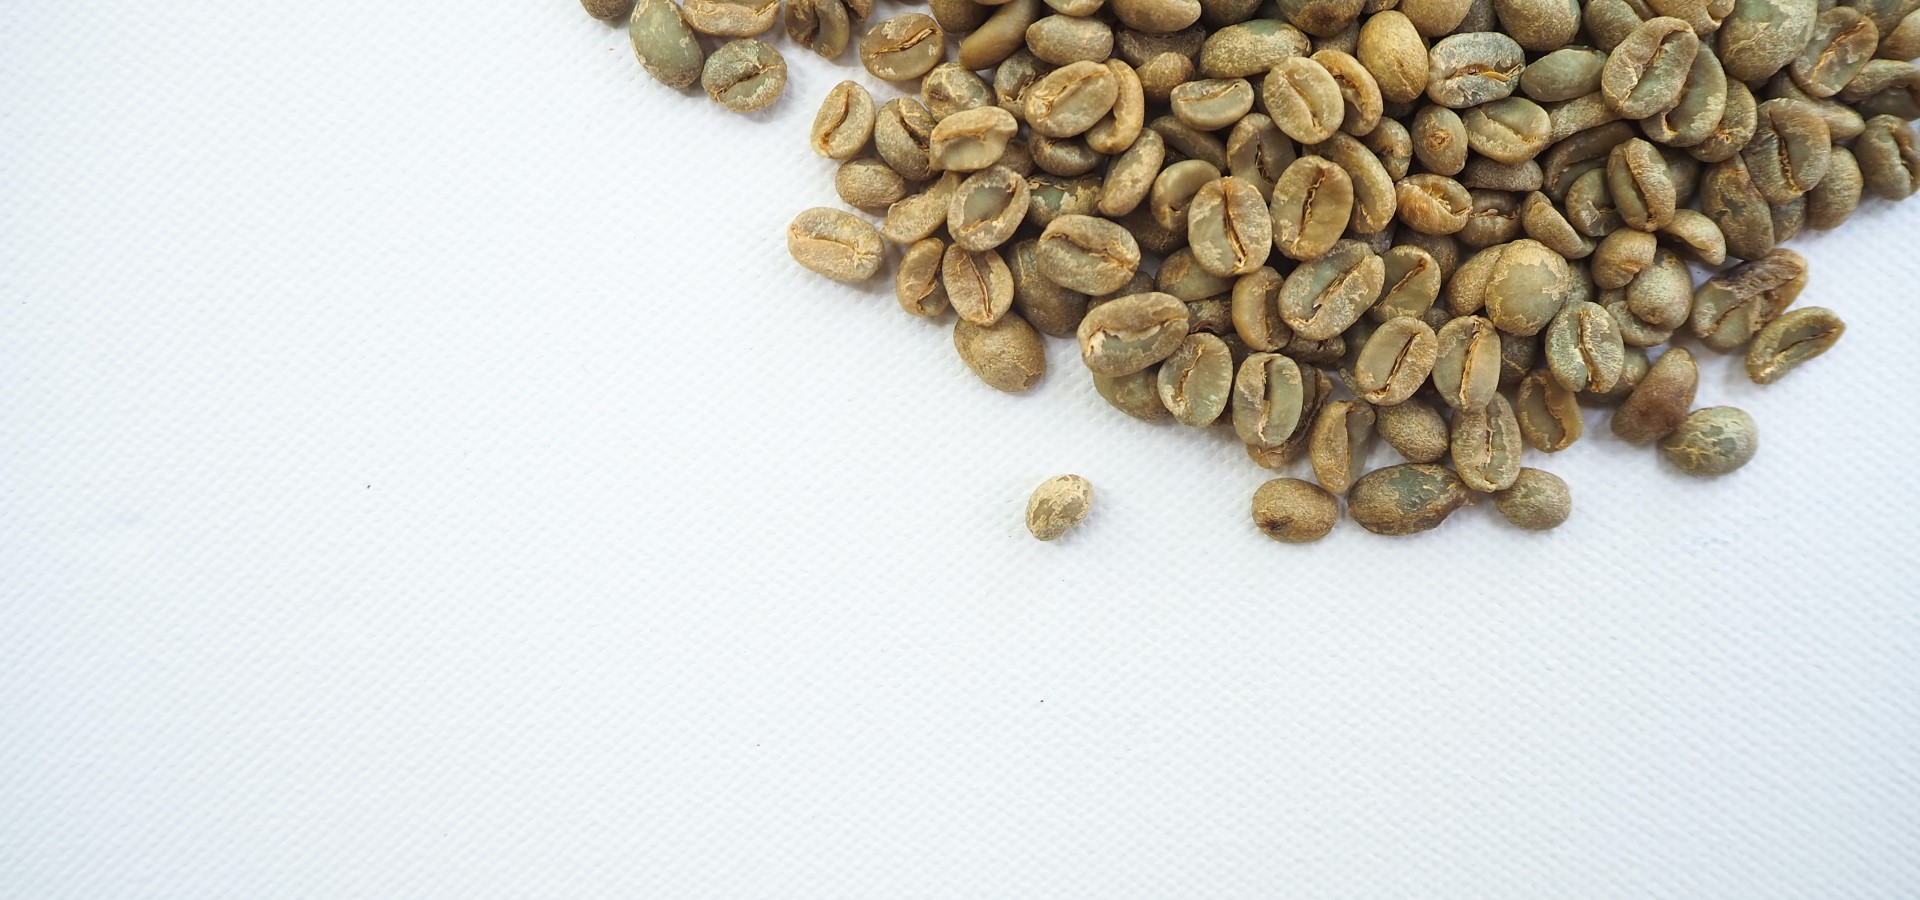 coffee-geek-1iL0lUqRWDY-unsplash (Custom)